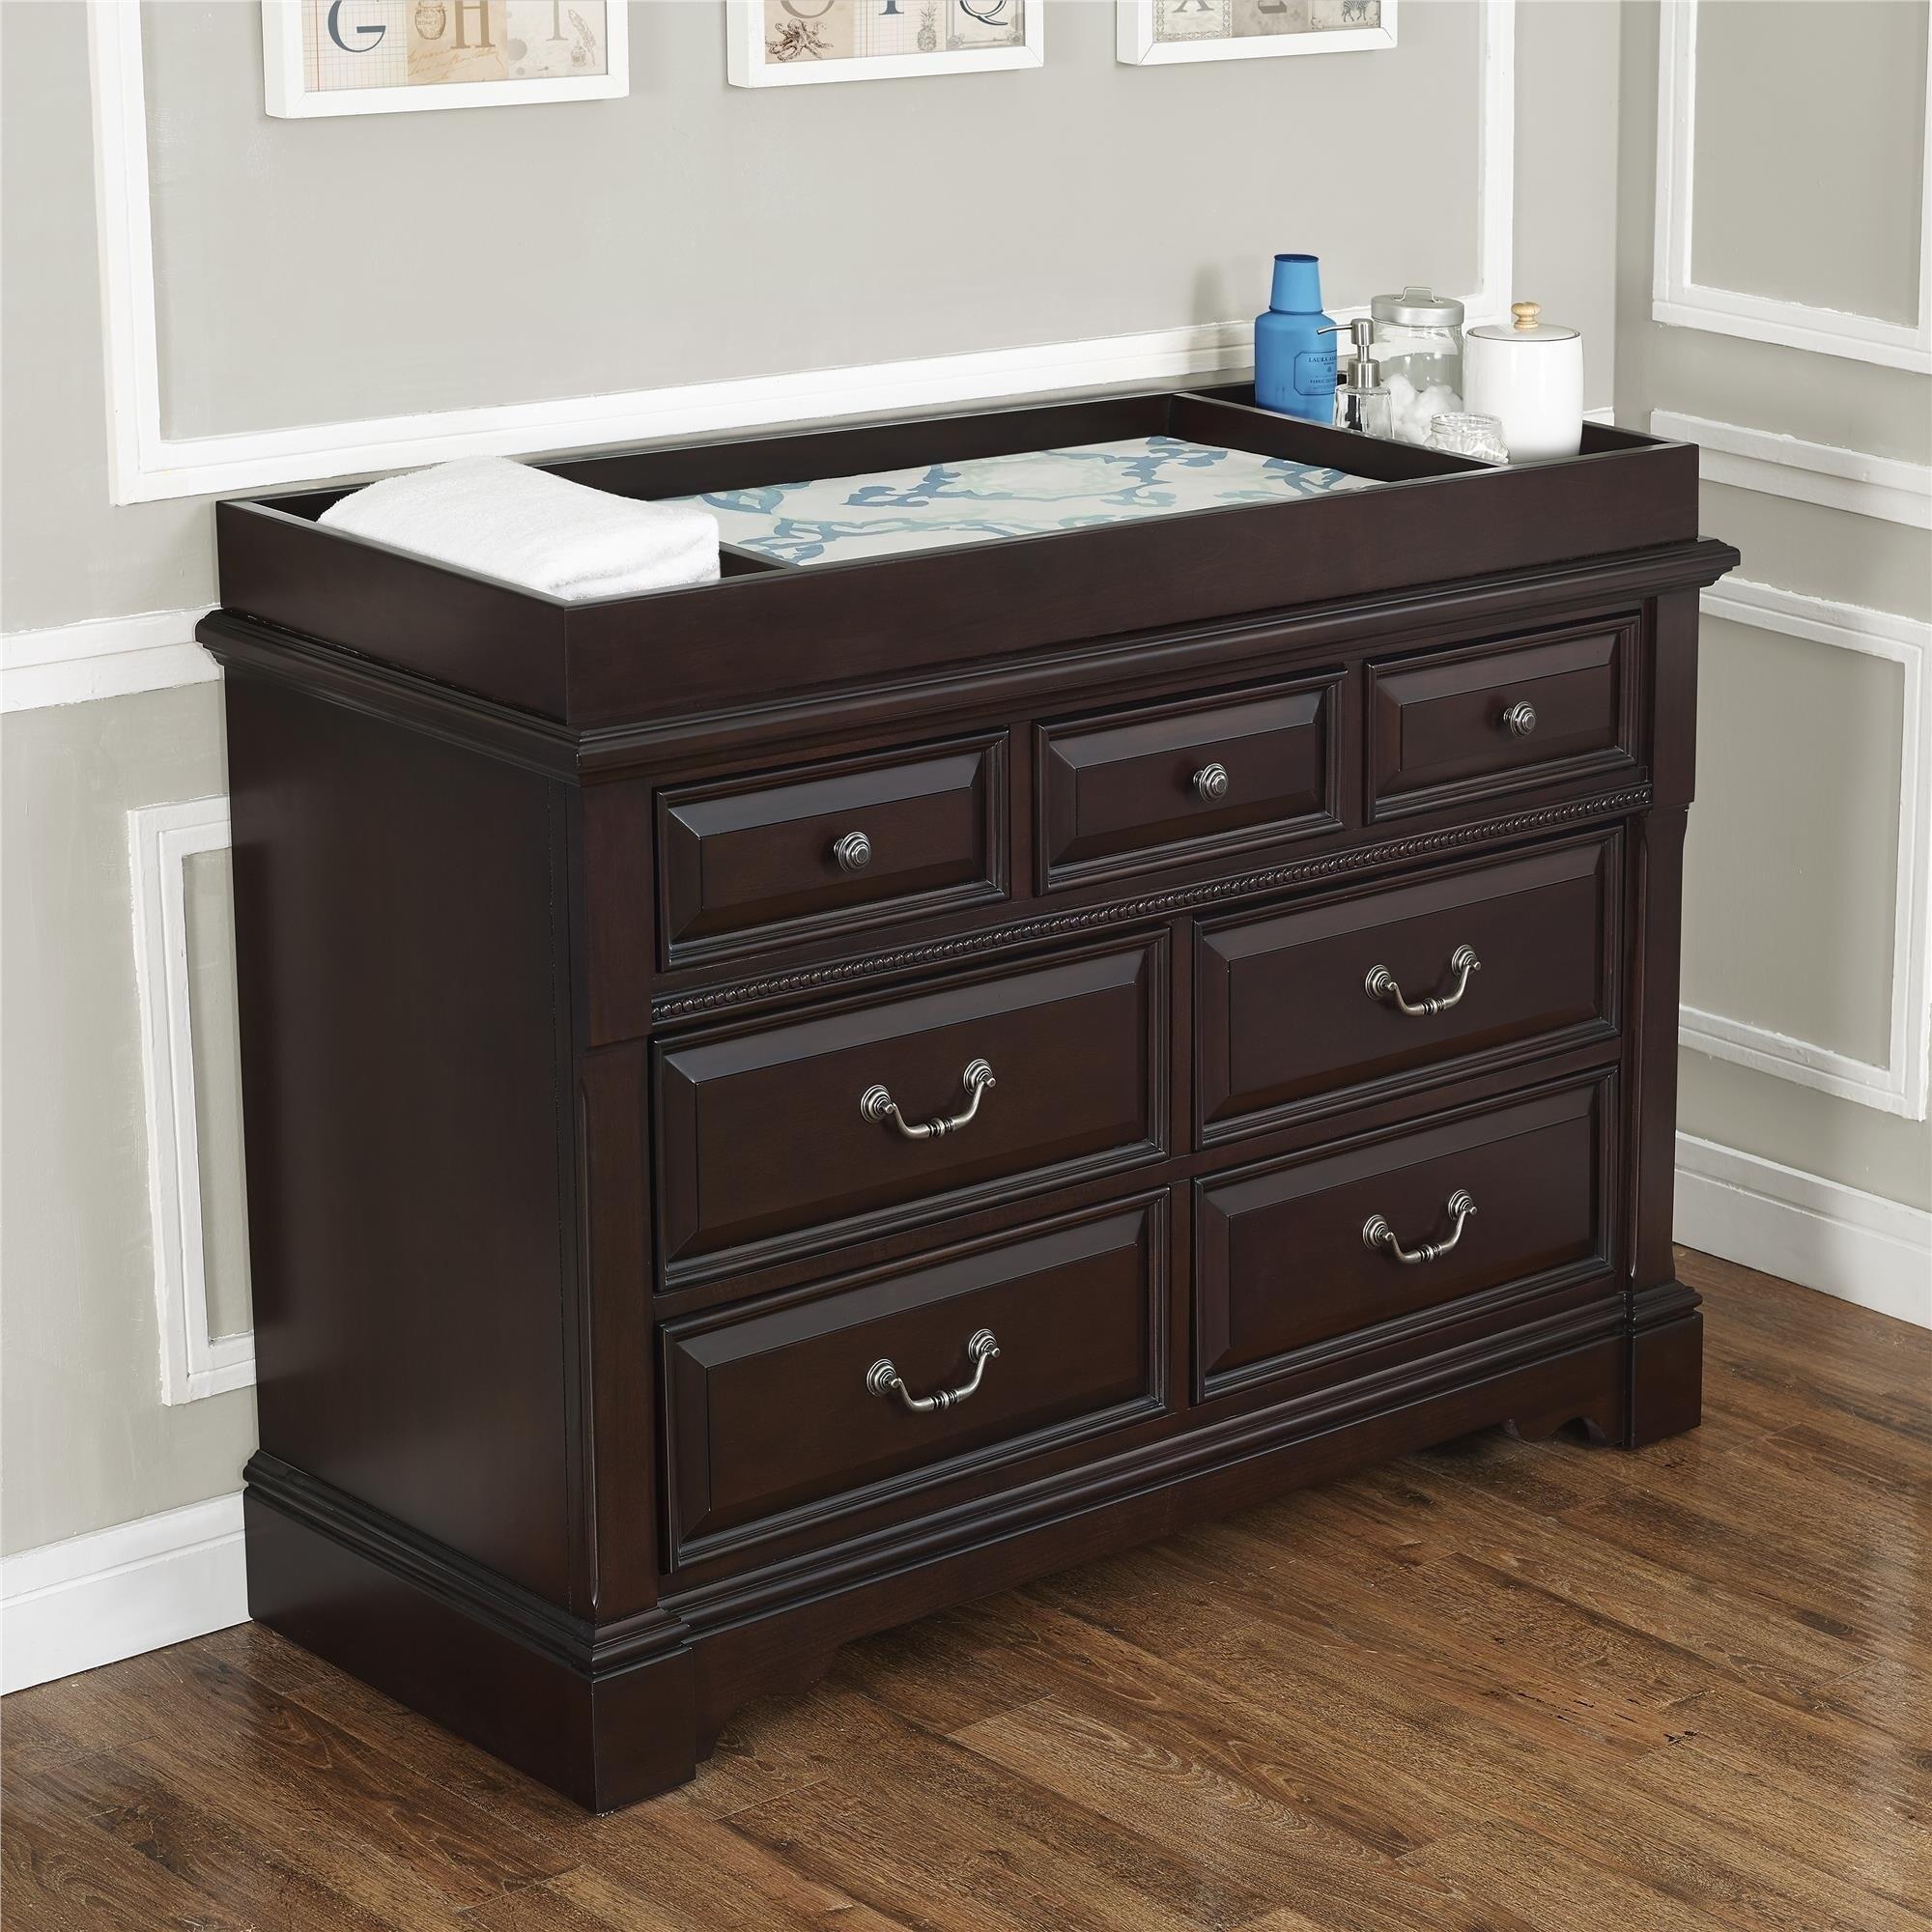 to collection design chest dressers measurements with dresser shore x south espresso drawer regard savannah